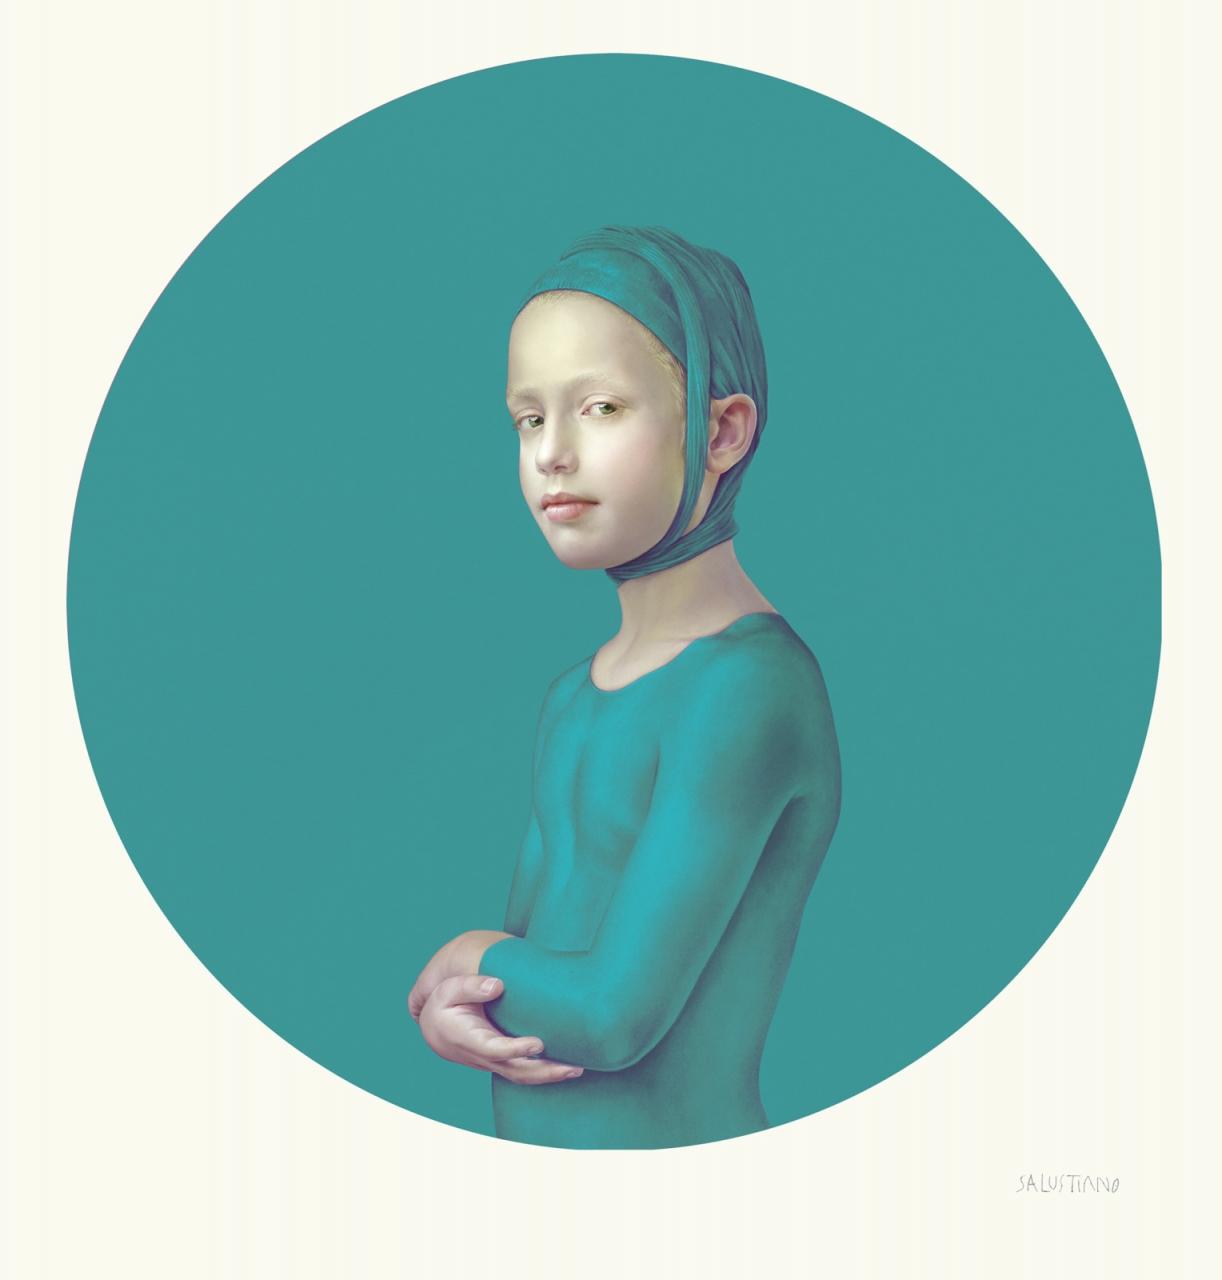 Roses June Stillness (türkis), 2018